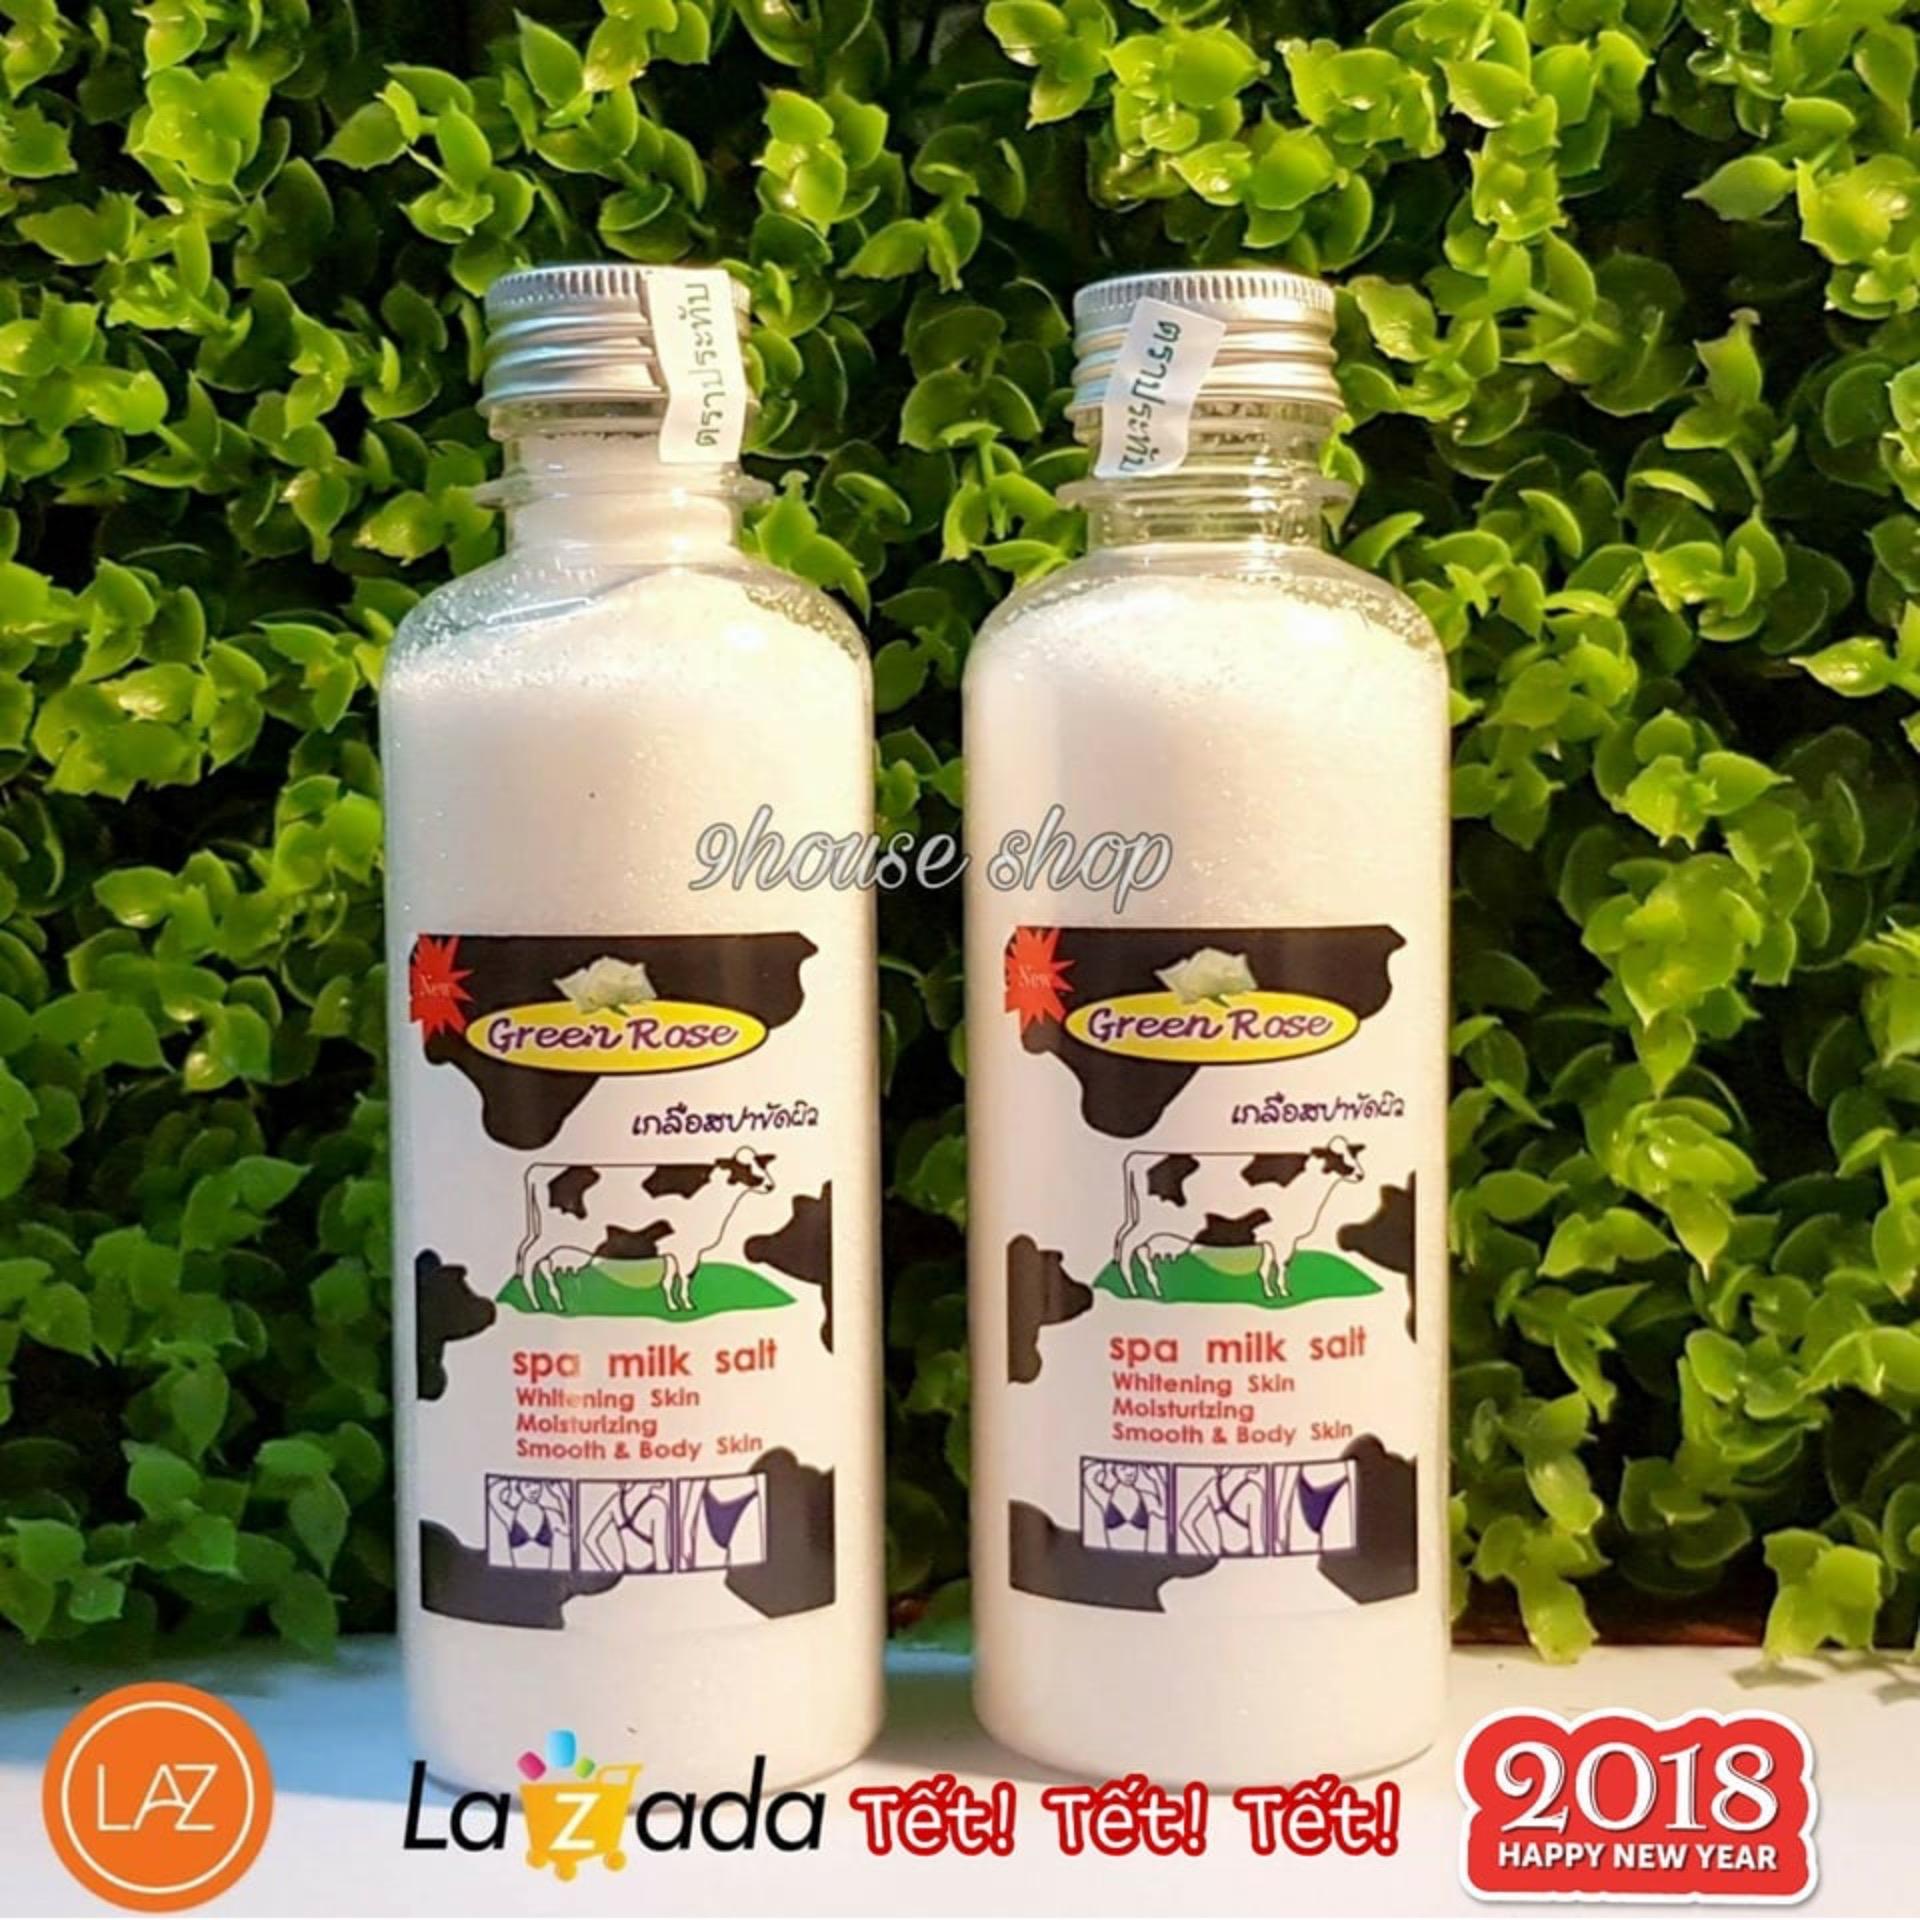 2 Chai Muối tắm sữa bò Green Rose Spa Milk Salt